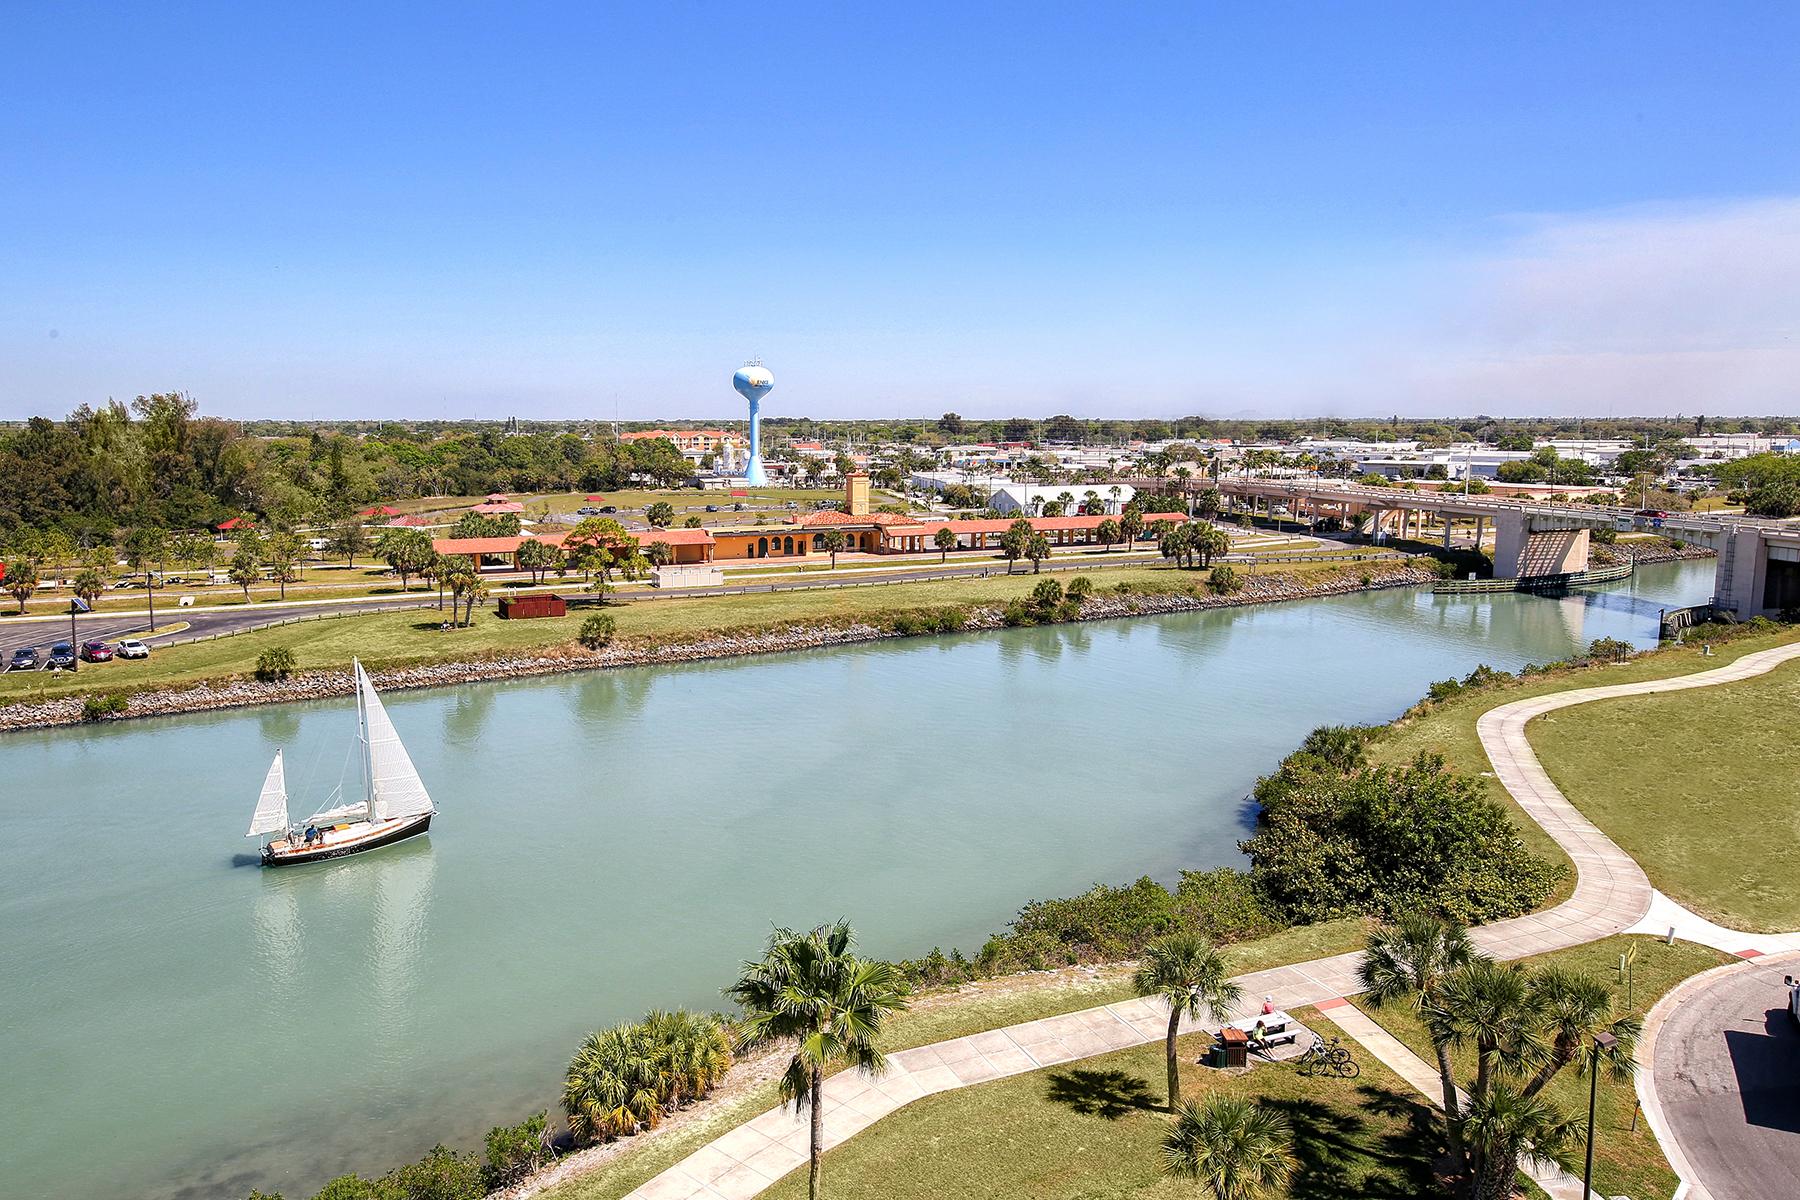 Condominium for Sale at WATERFRONT ON VENICE ISLAND 167 Tampa Ave E 815 Venice, Florida, 34285 United States